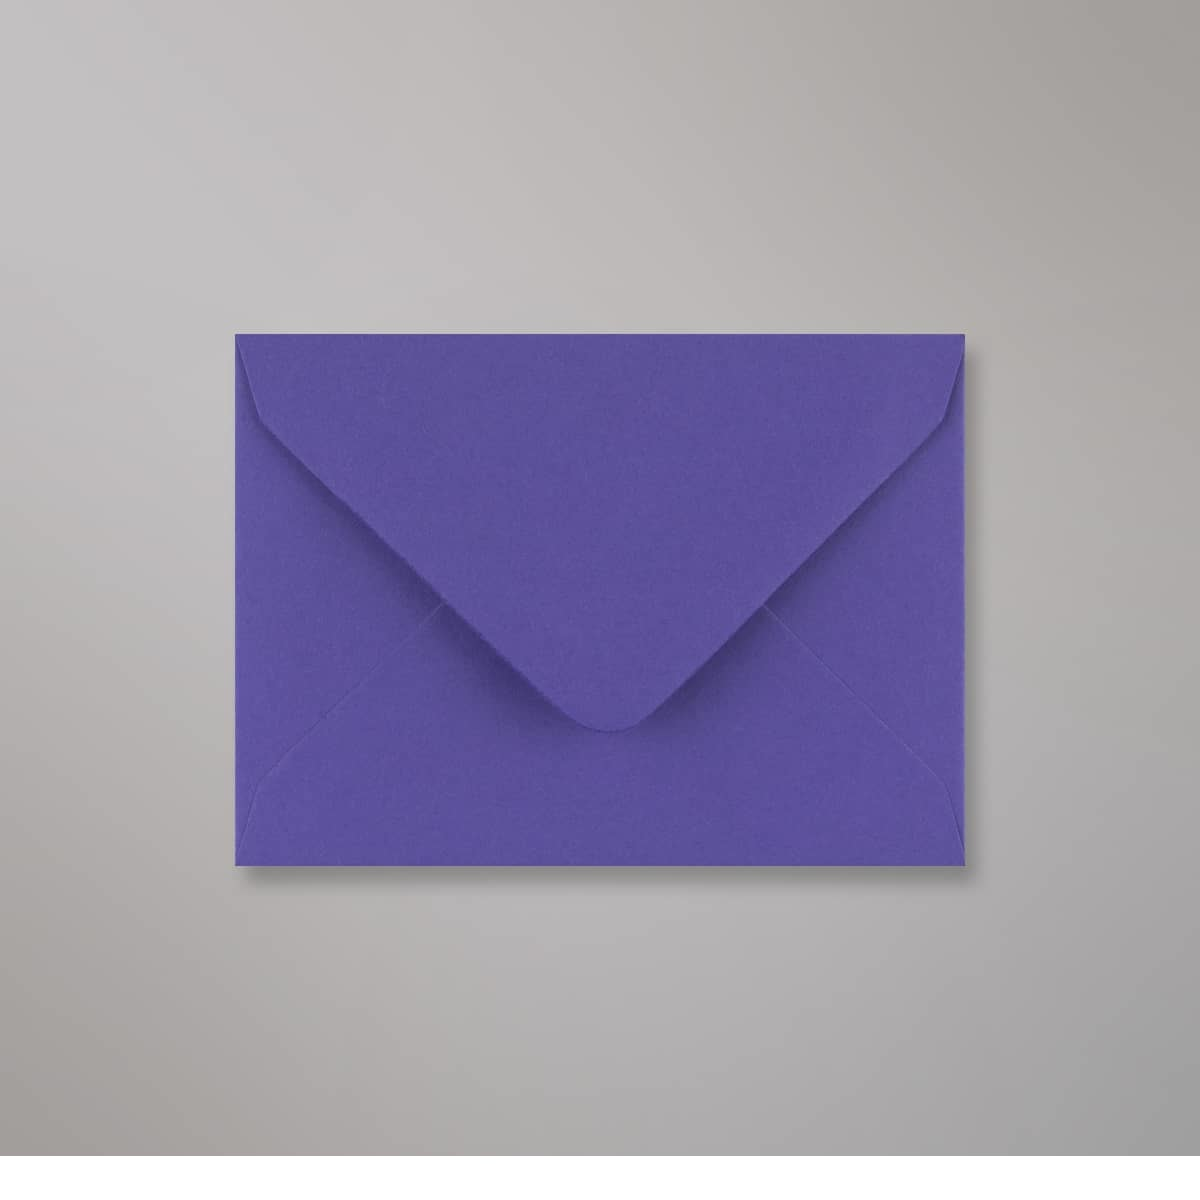 Enveloppe bleue iris 82x113 mm (C7)